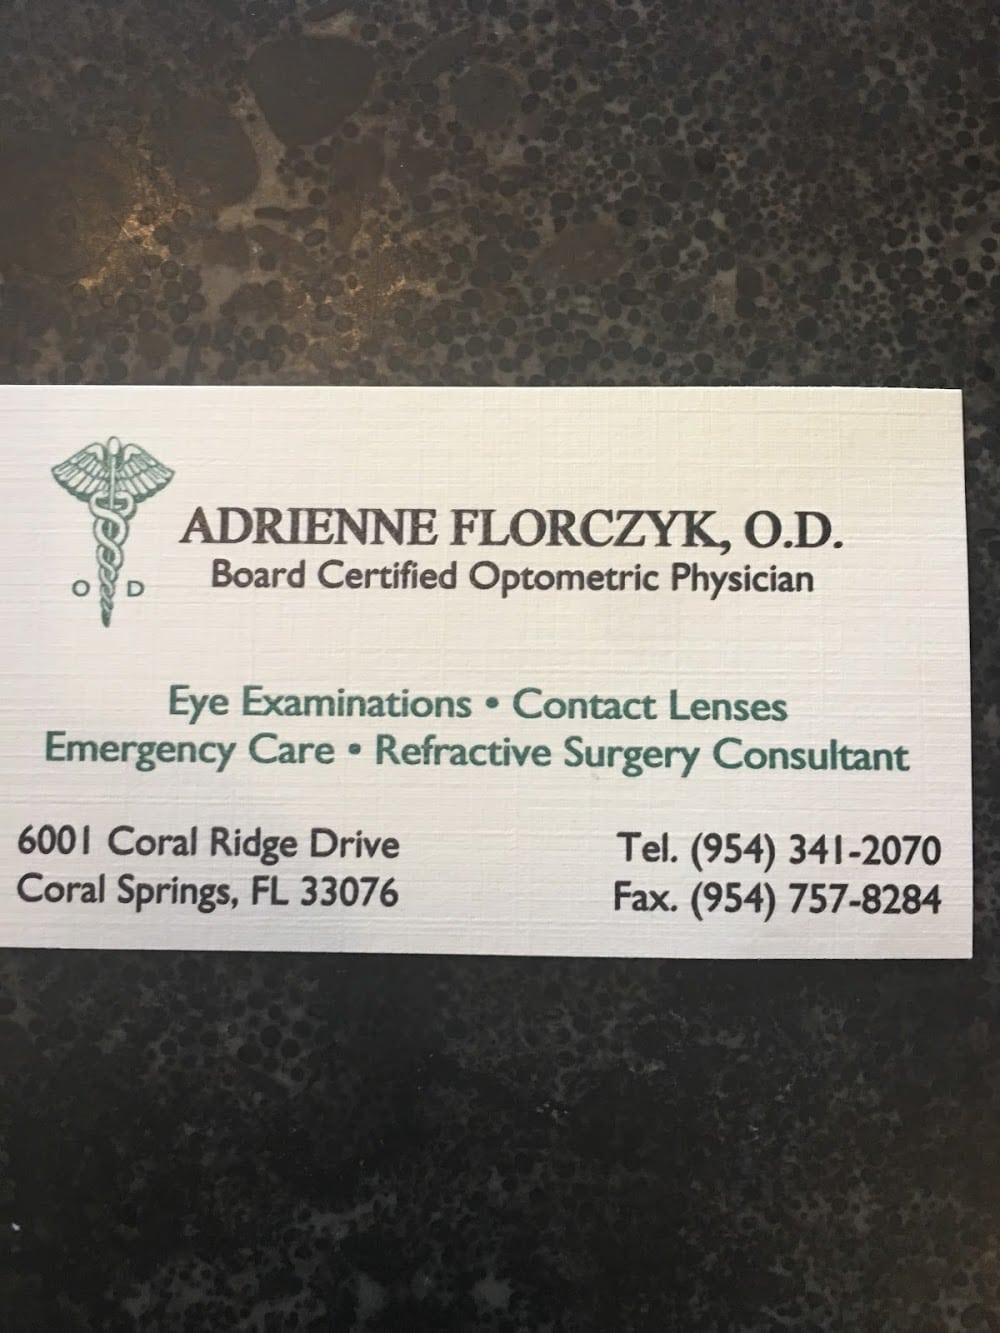 Dr Adrienne Florczyk & Associates